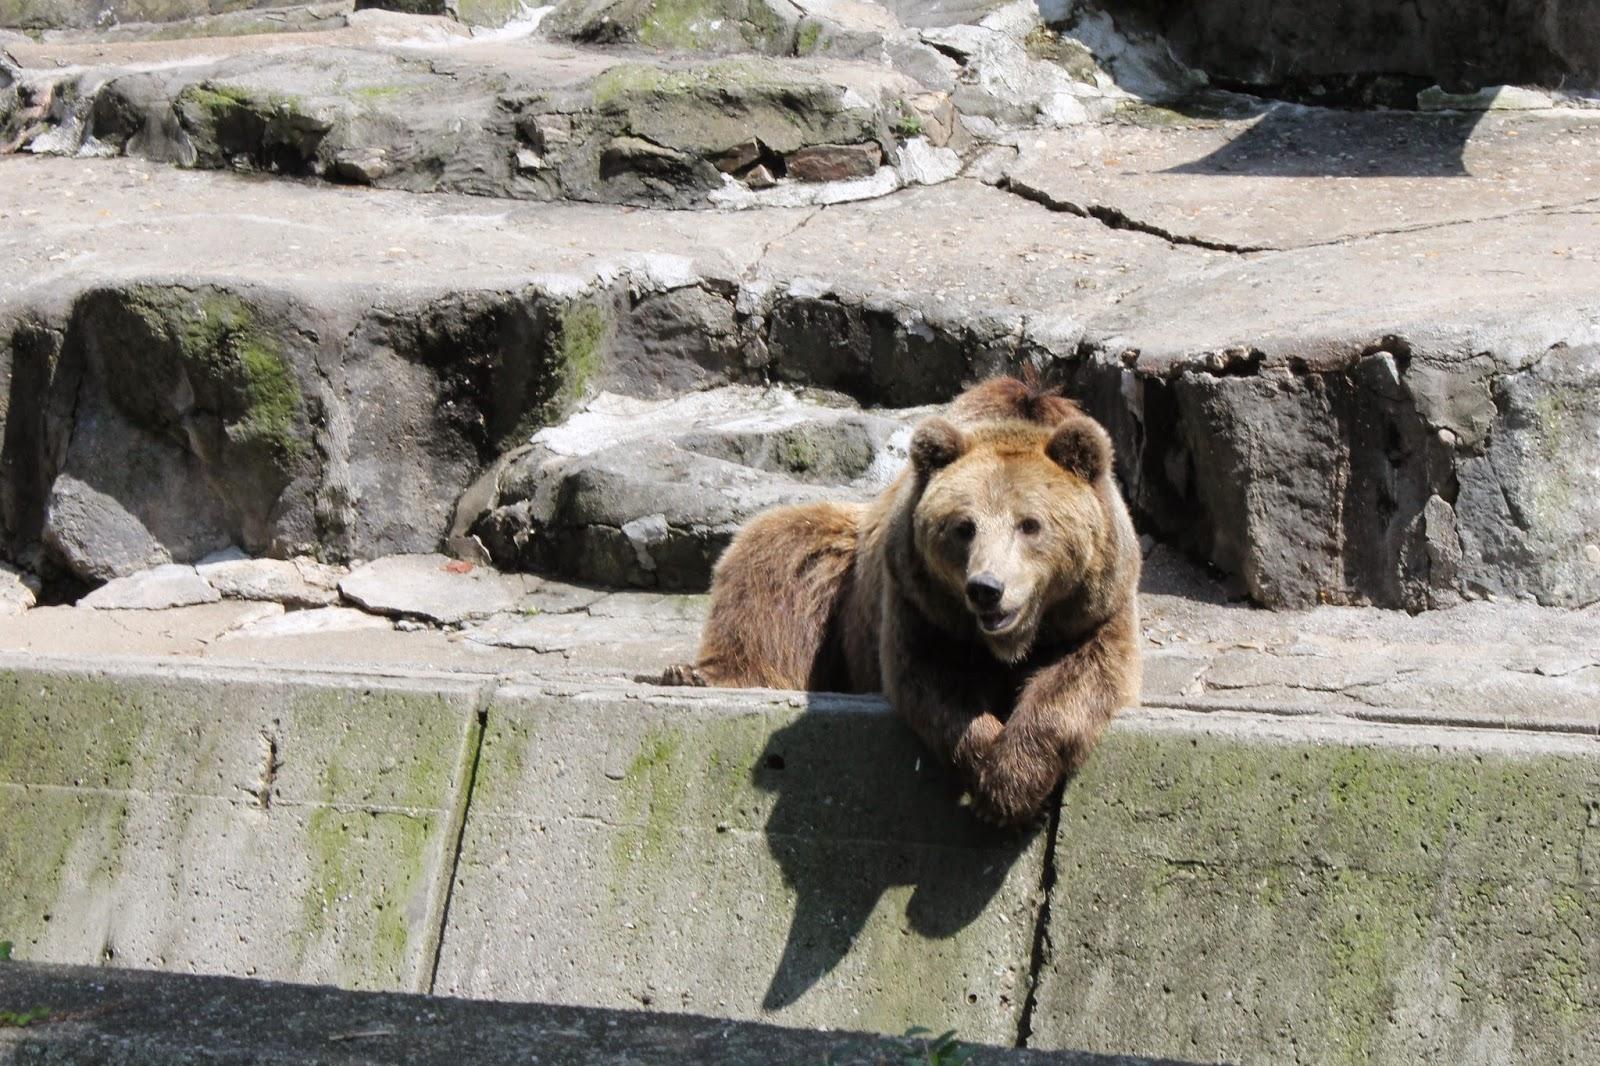 Seoul Zoo, Seoul, зоопарк в сеуле, сеул, корея, зоопарк, медведь